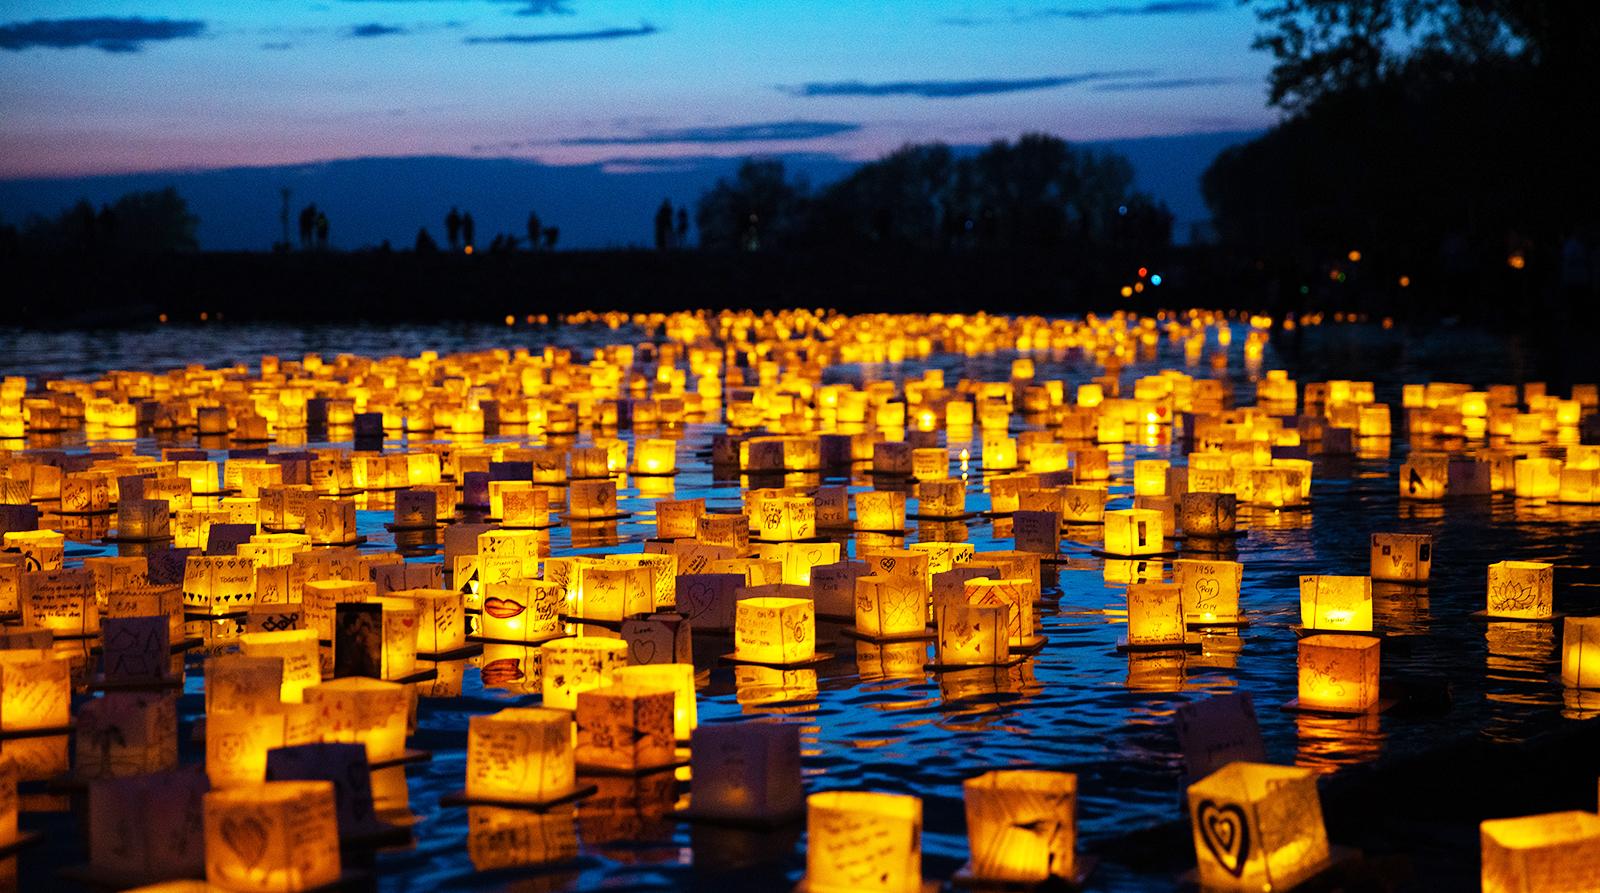 Water Lantern Festival at Humboldt Park